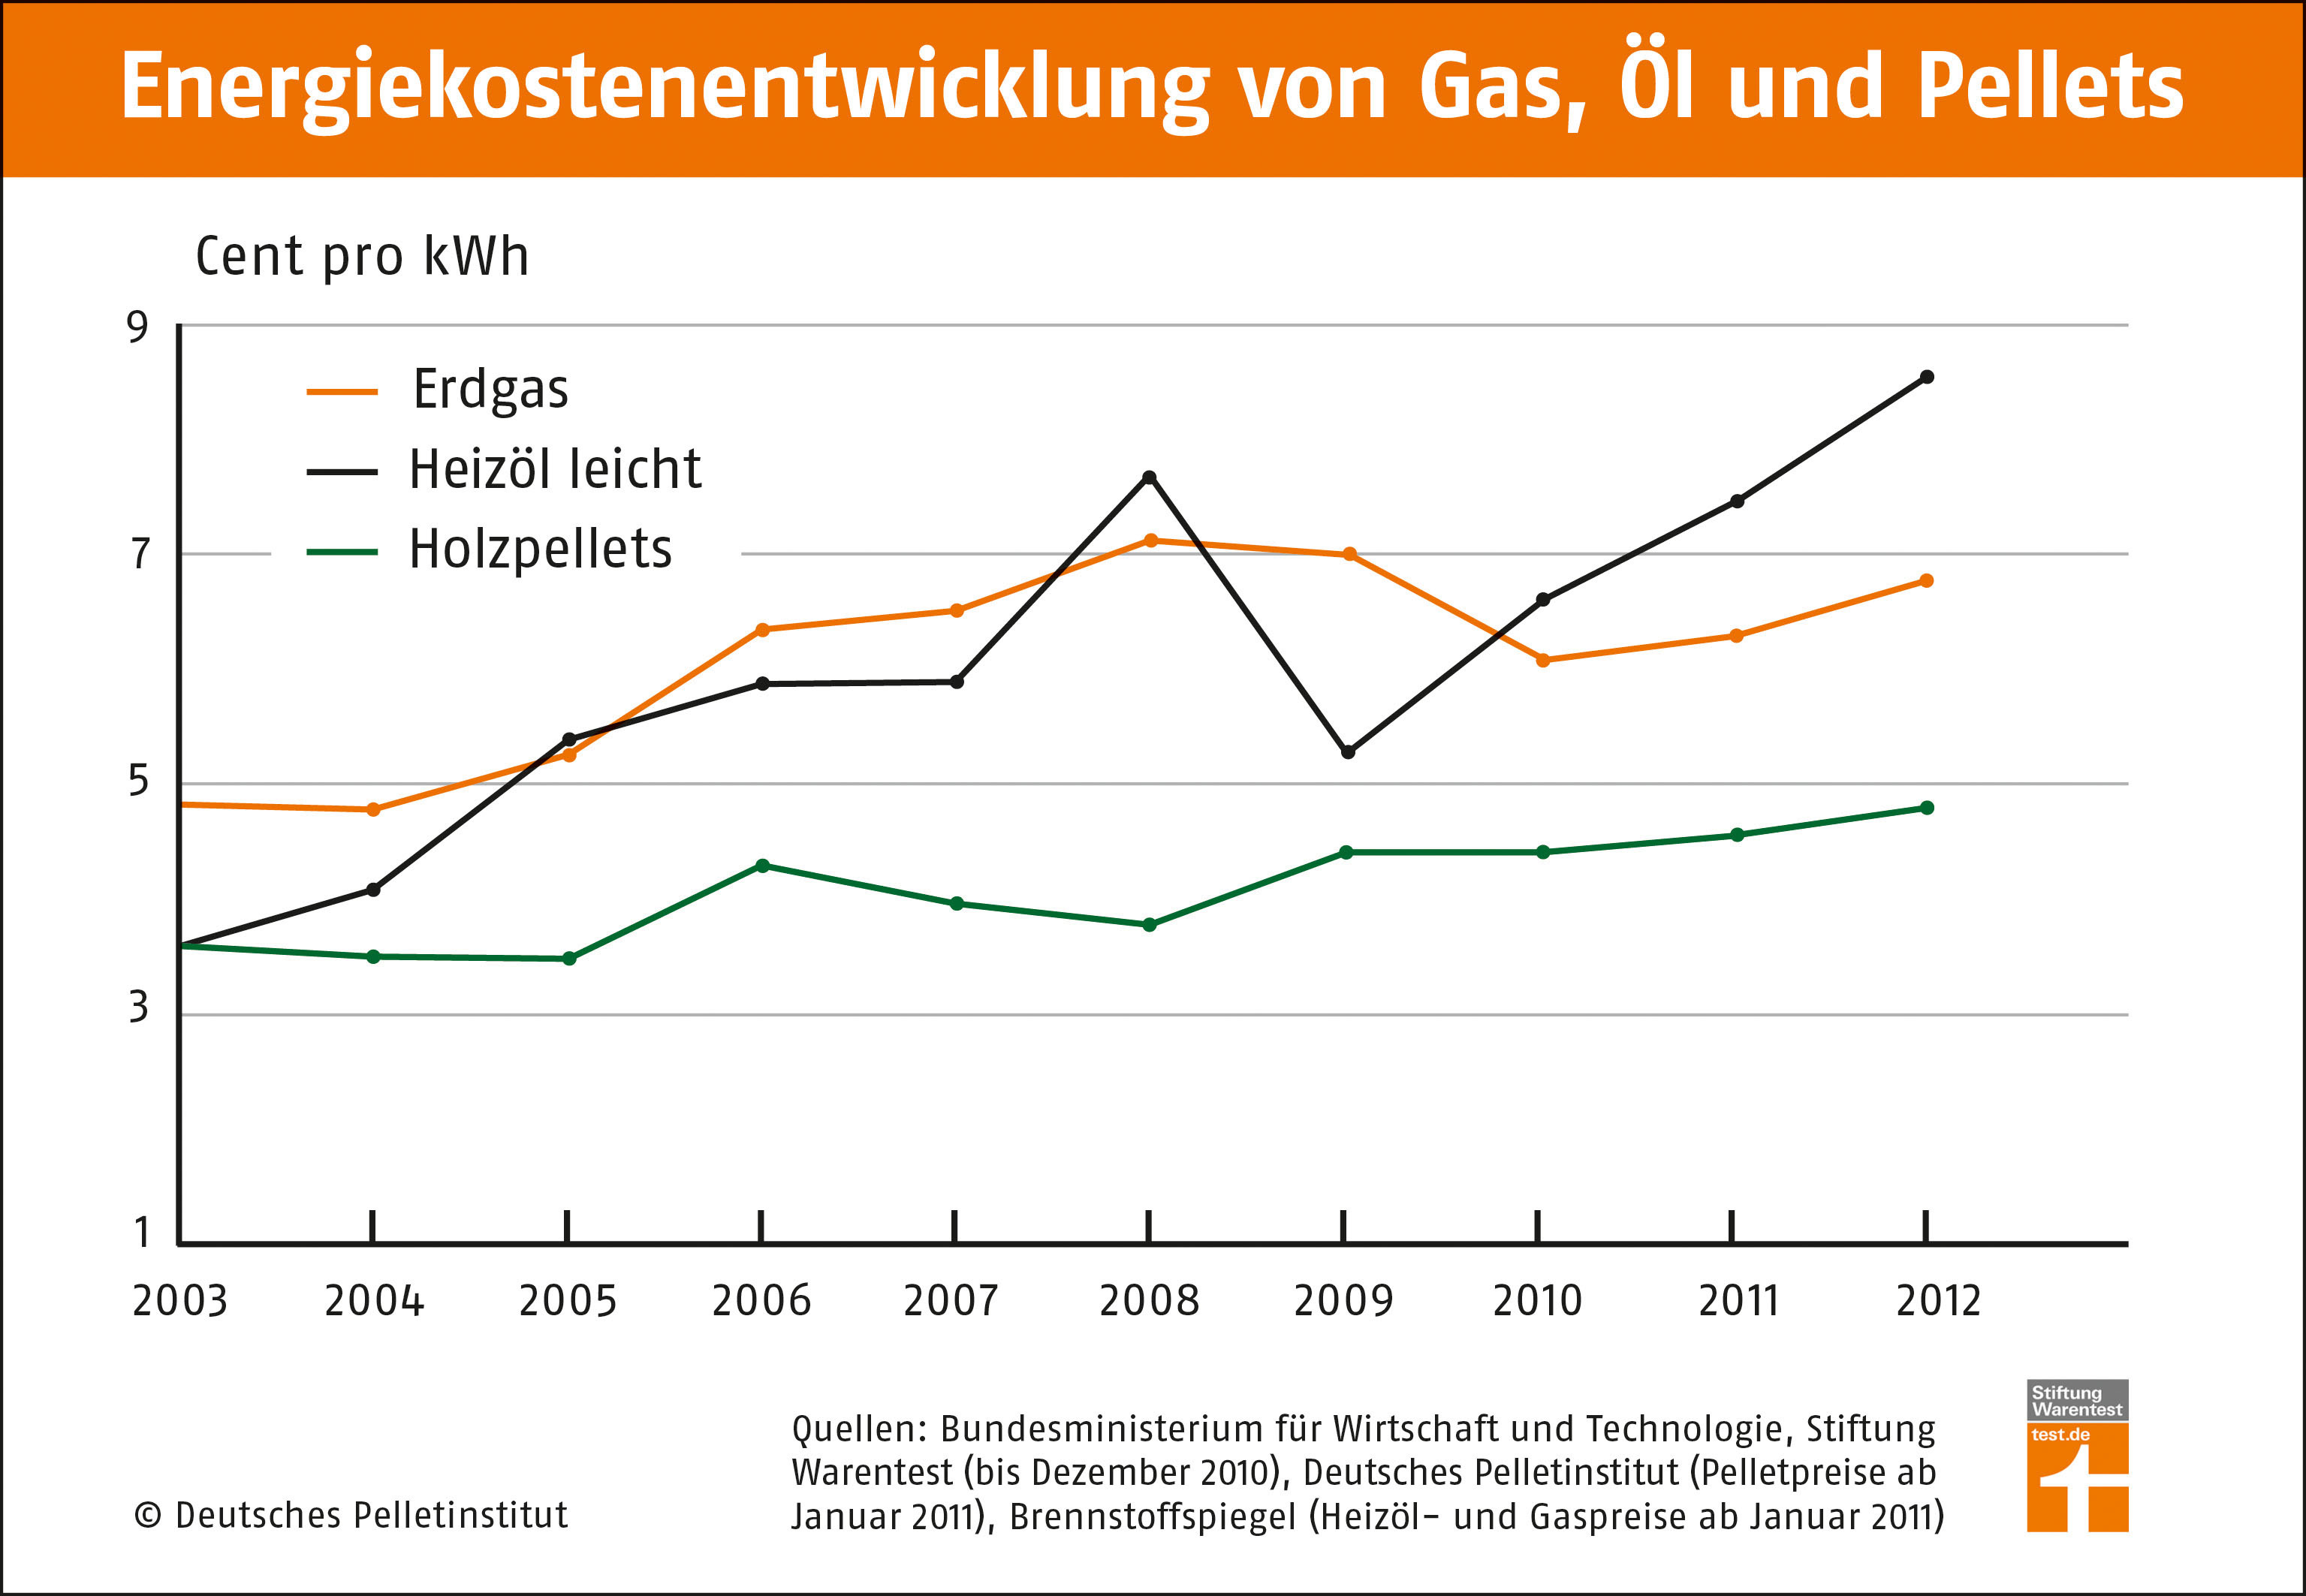 Energiekostenentwicklung-Gas-Oel-Pellets